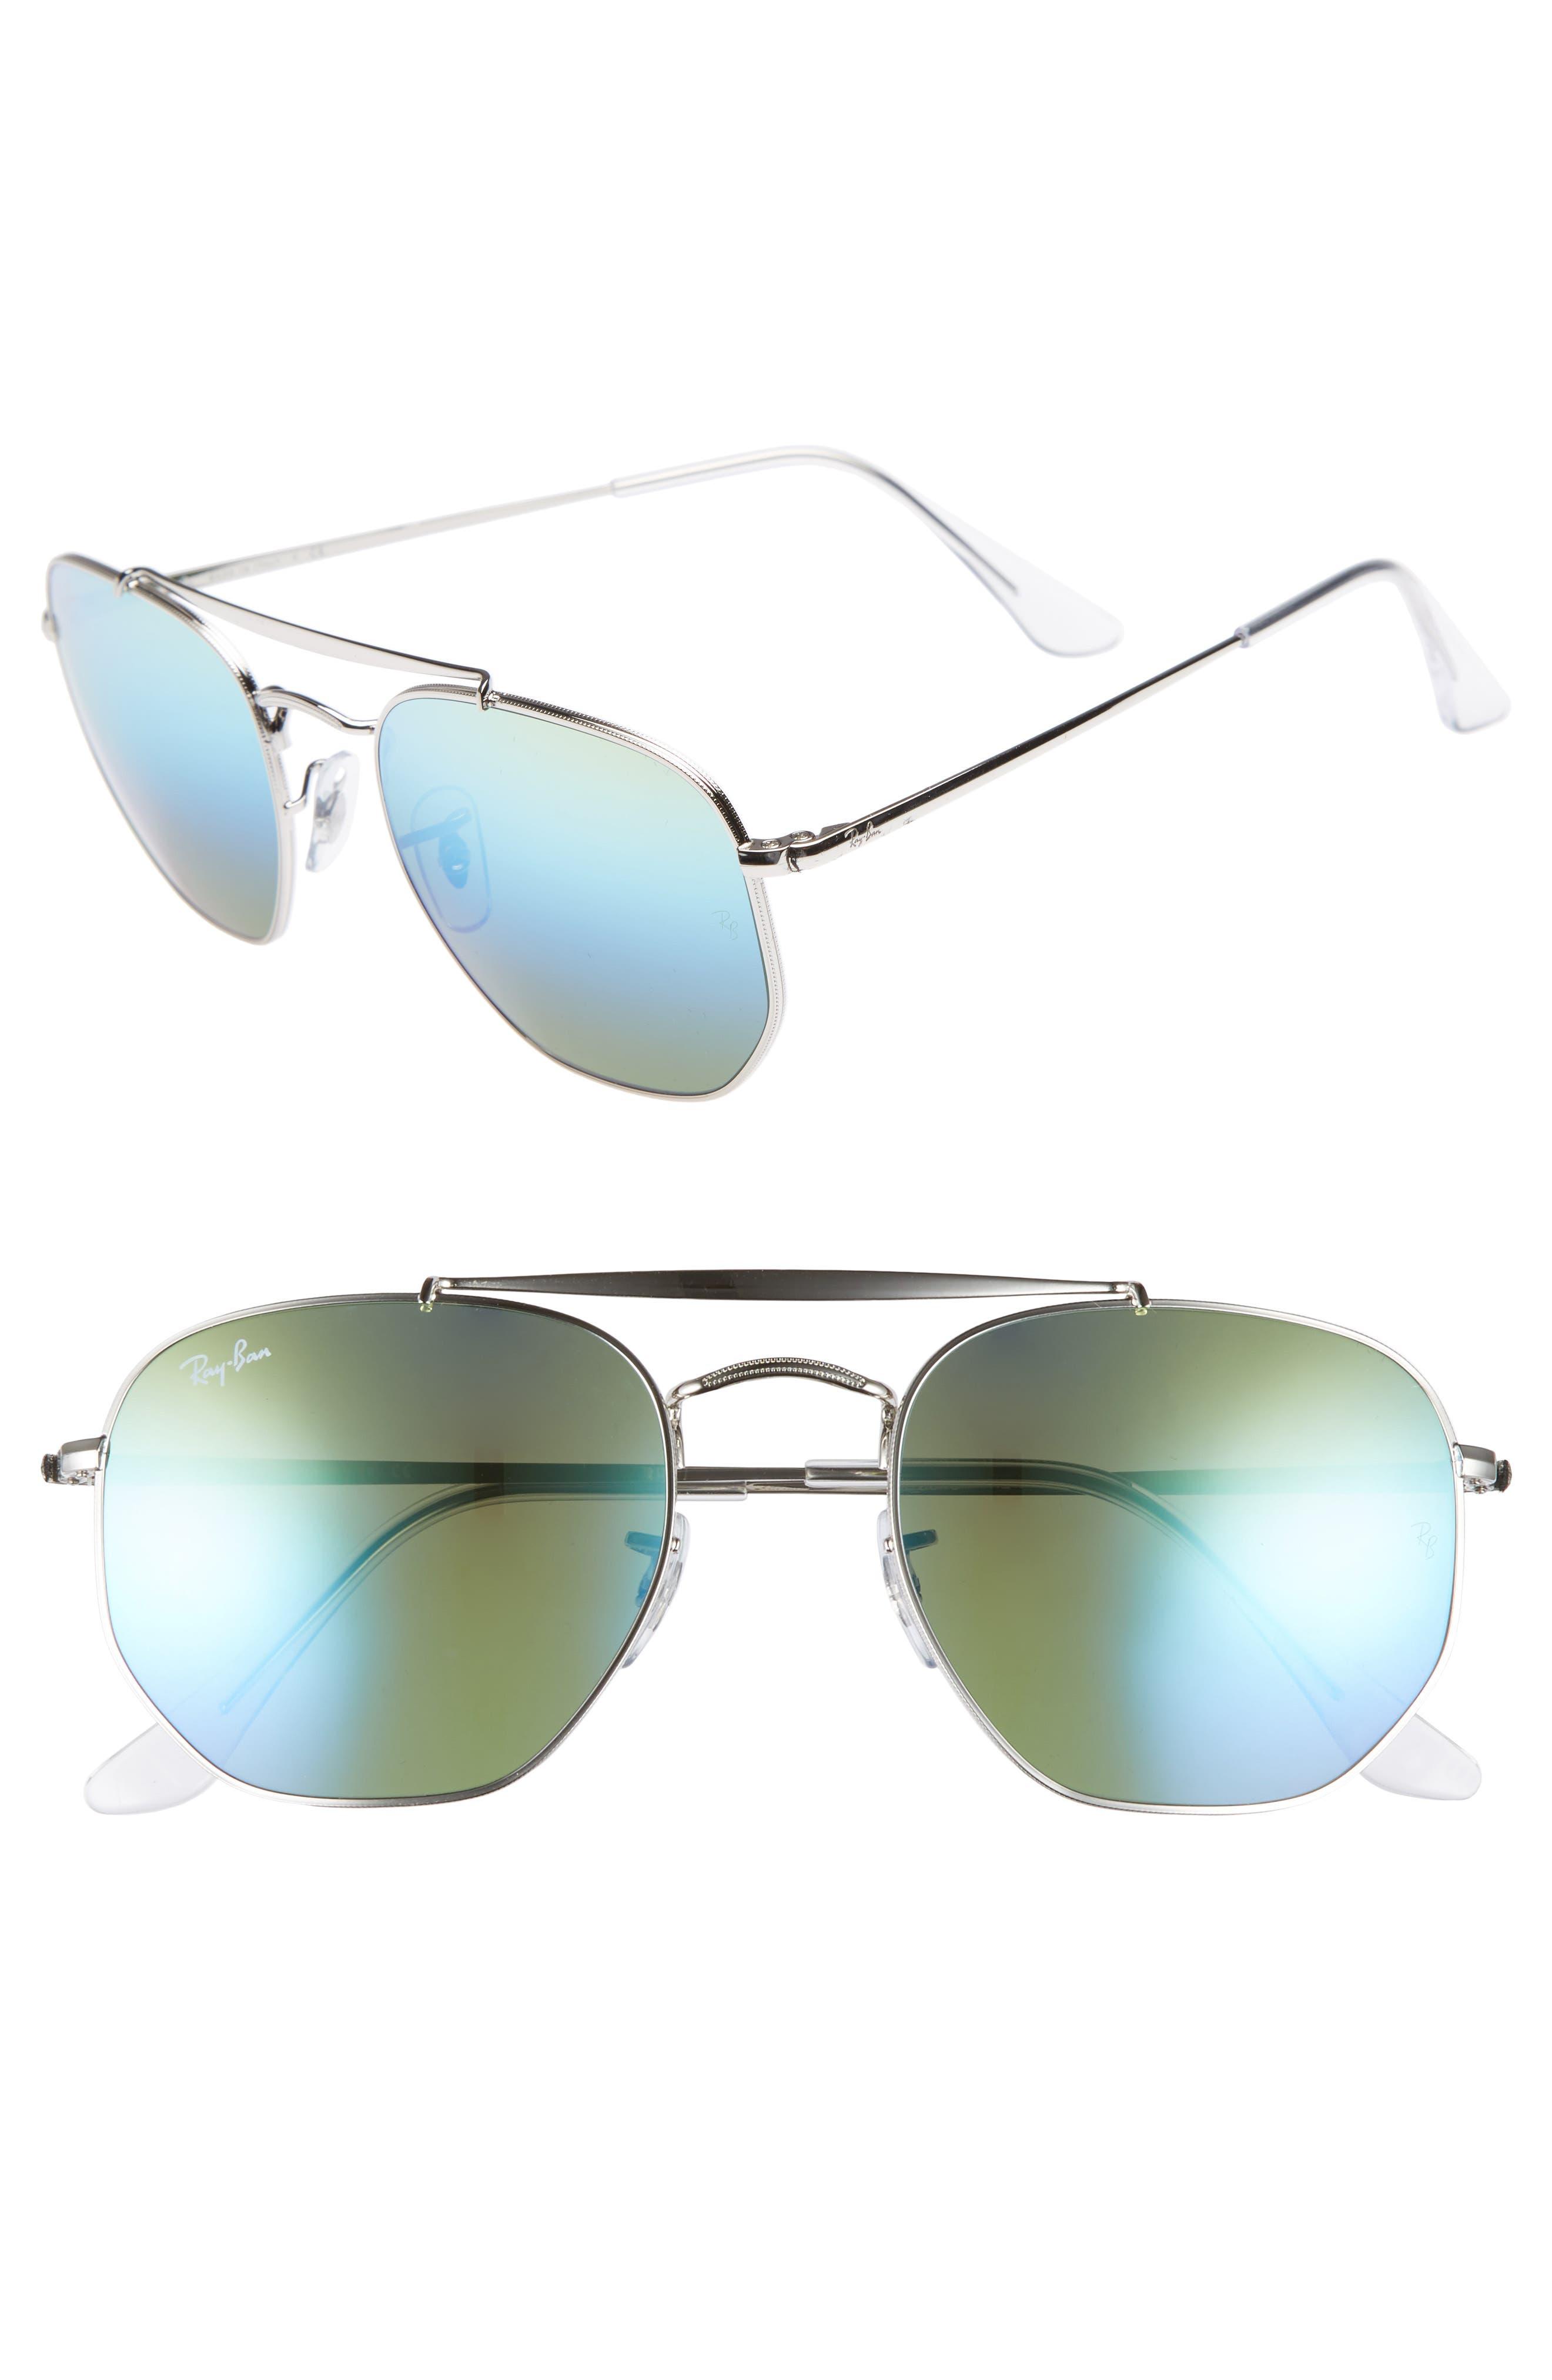 Main Image - Ray-Ban Marshal 54mm Aviator Sunglasses